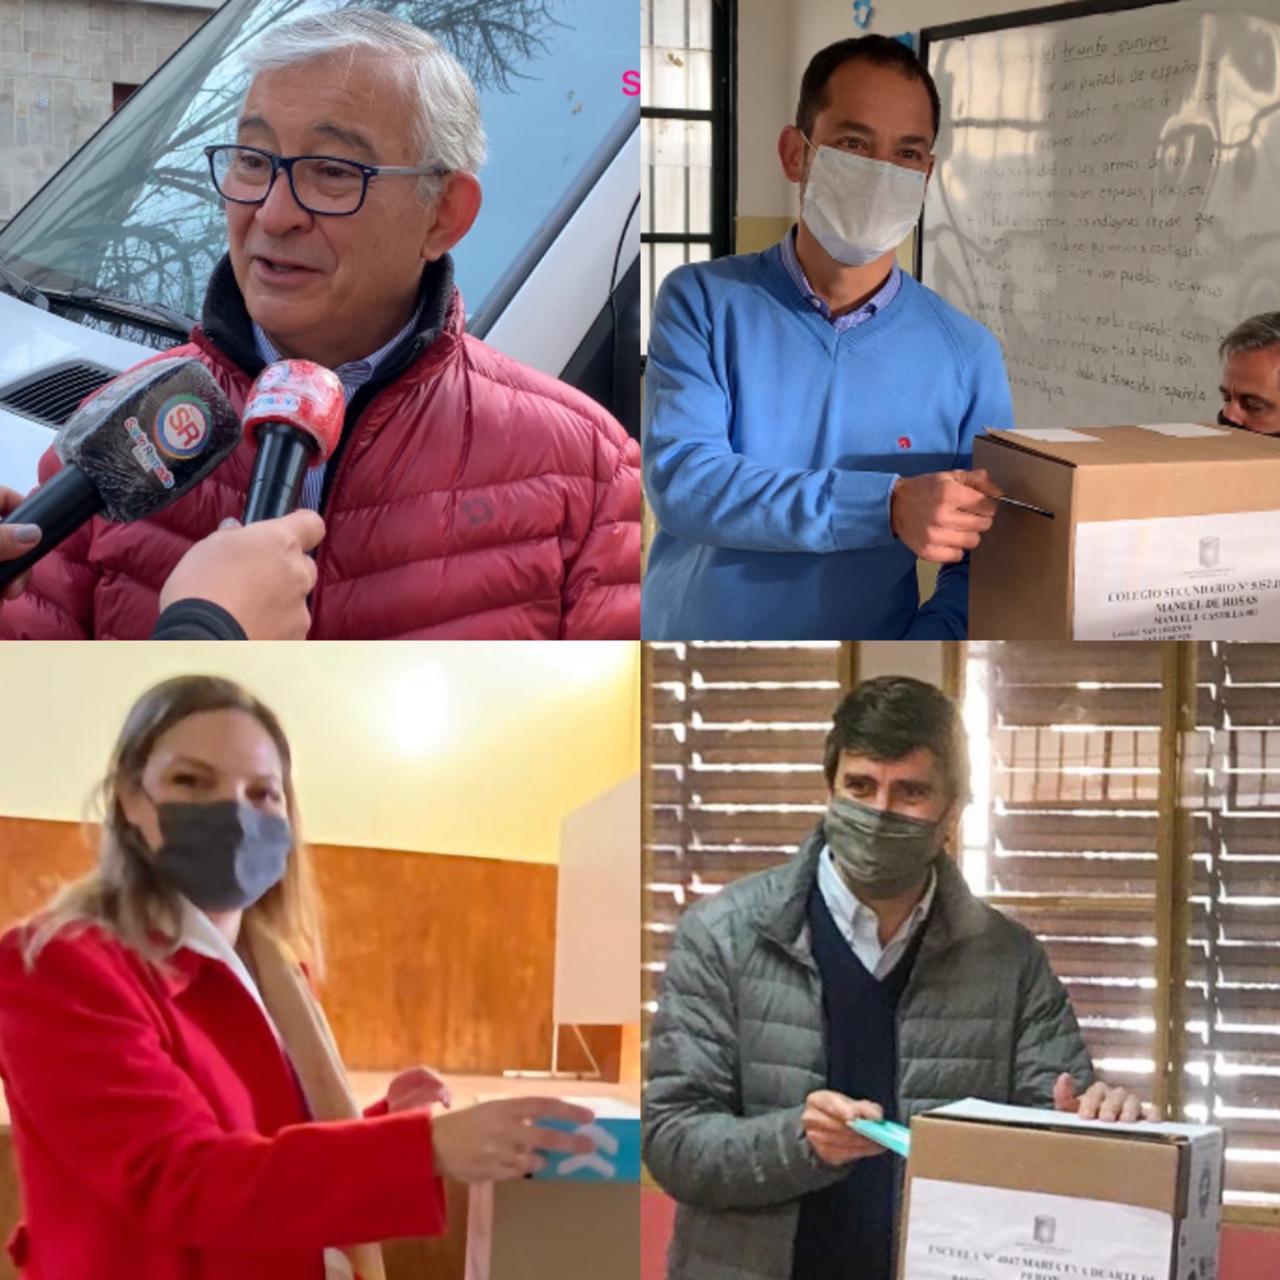 #SaltaElige: Asi votaron algunos candidatos a senador por la capital